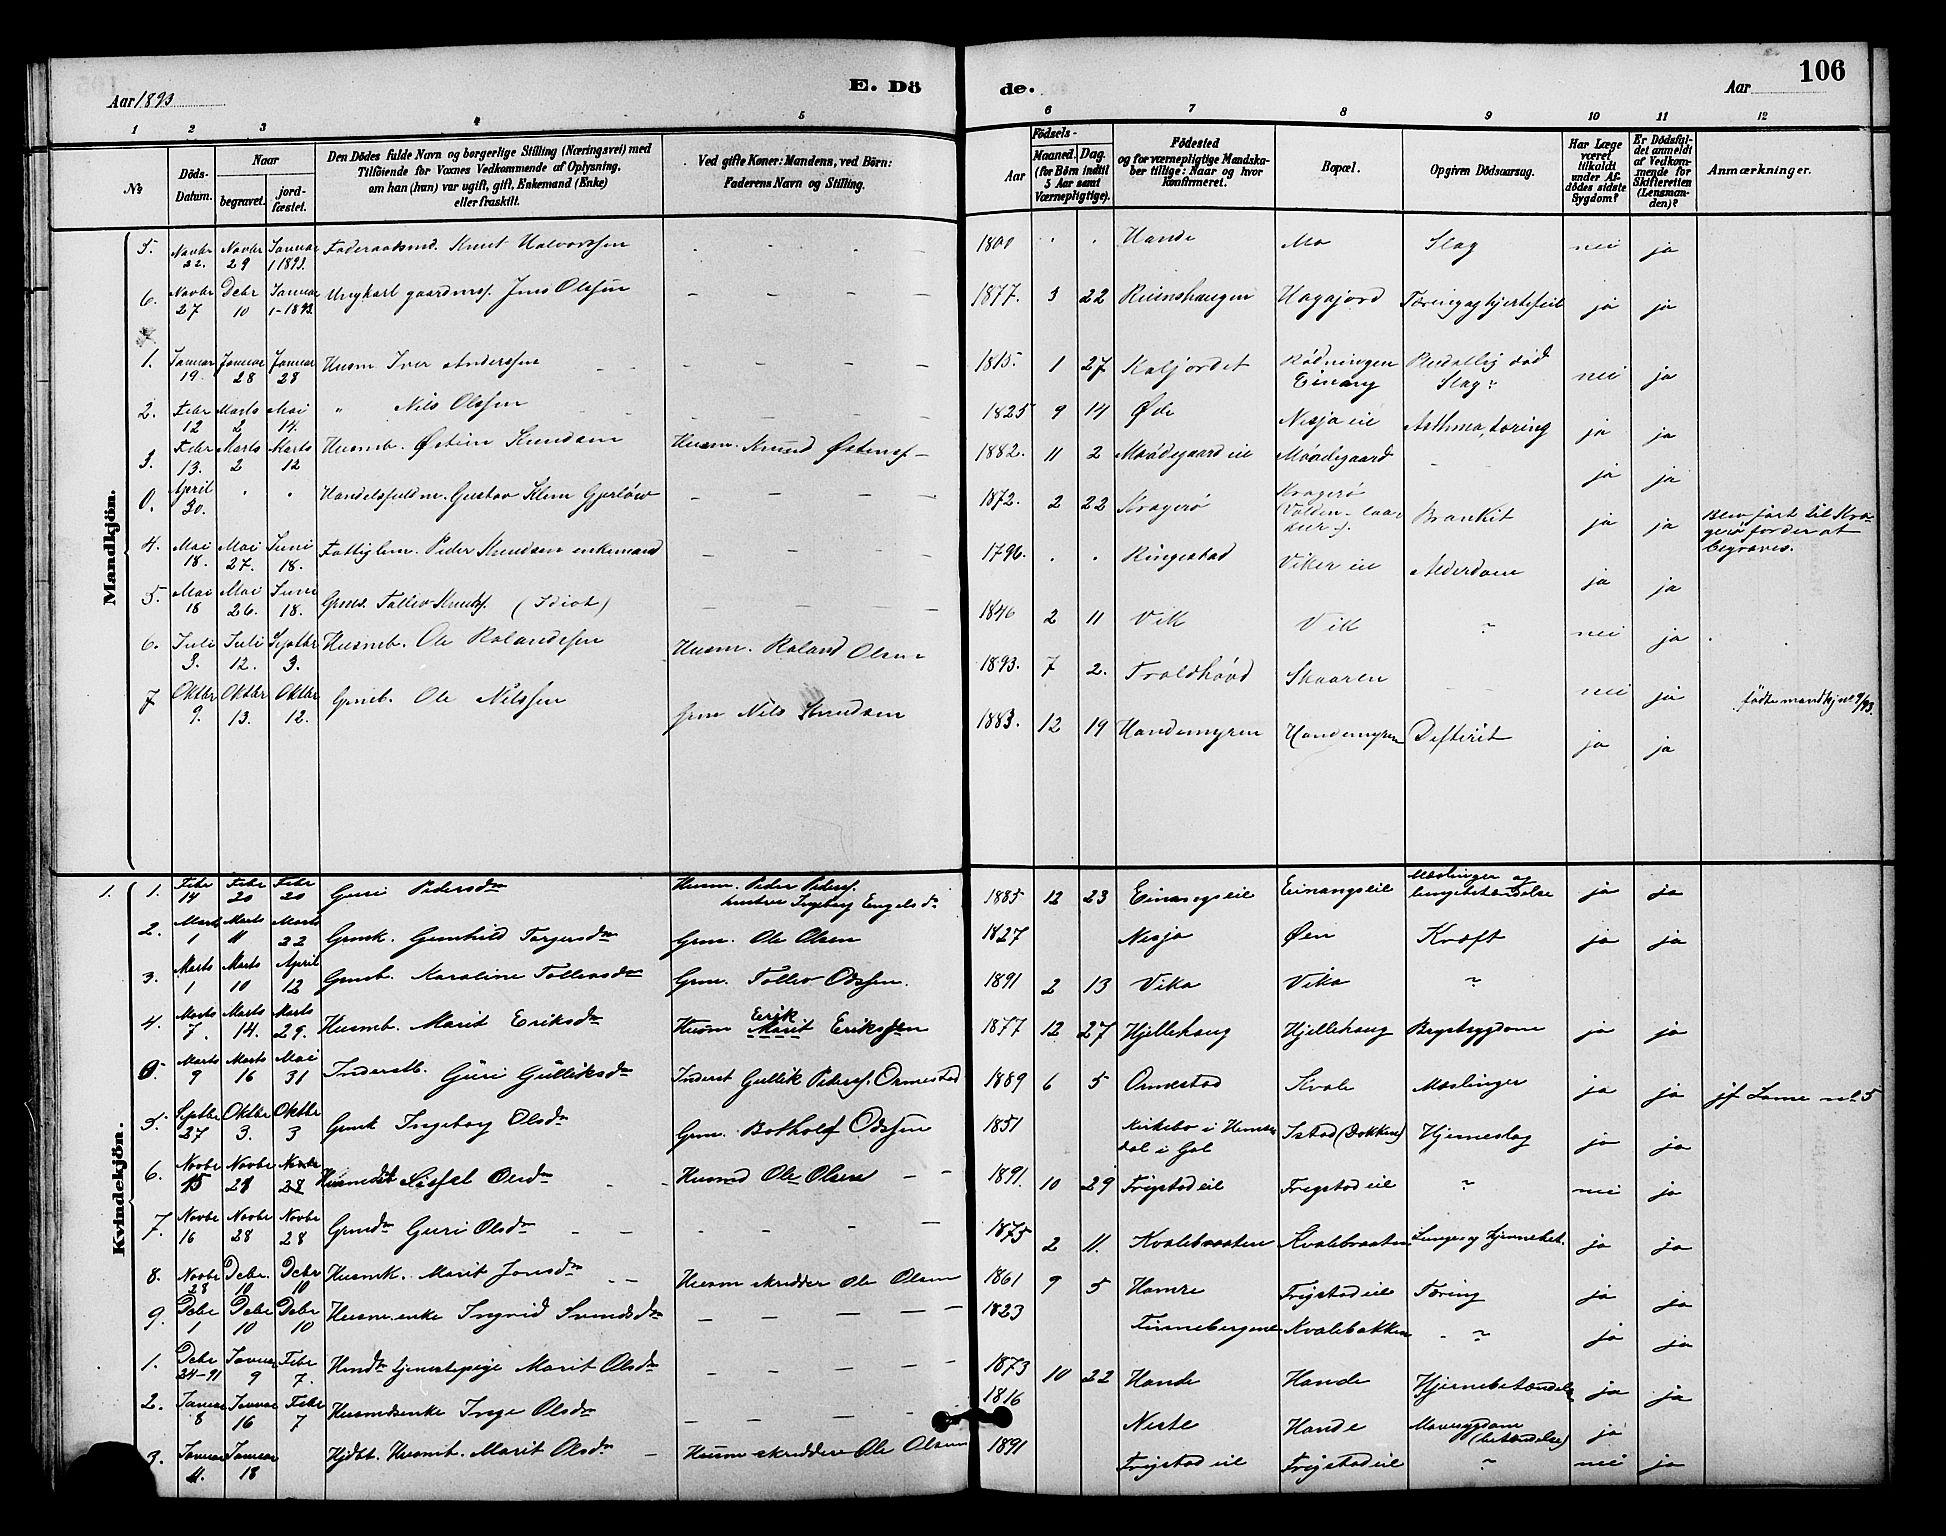 SAH, Vestre Slidre prestekontor, Klokkerbok nr. 4, 1881-1912, s. 106